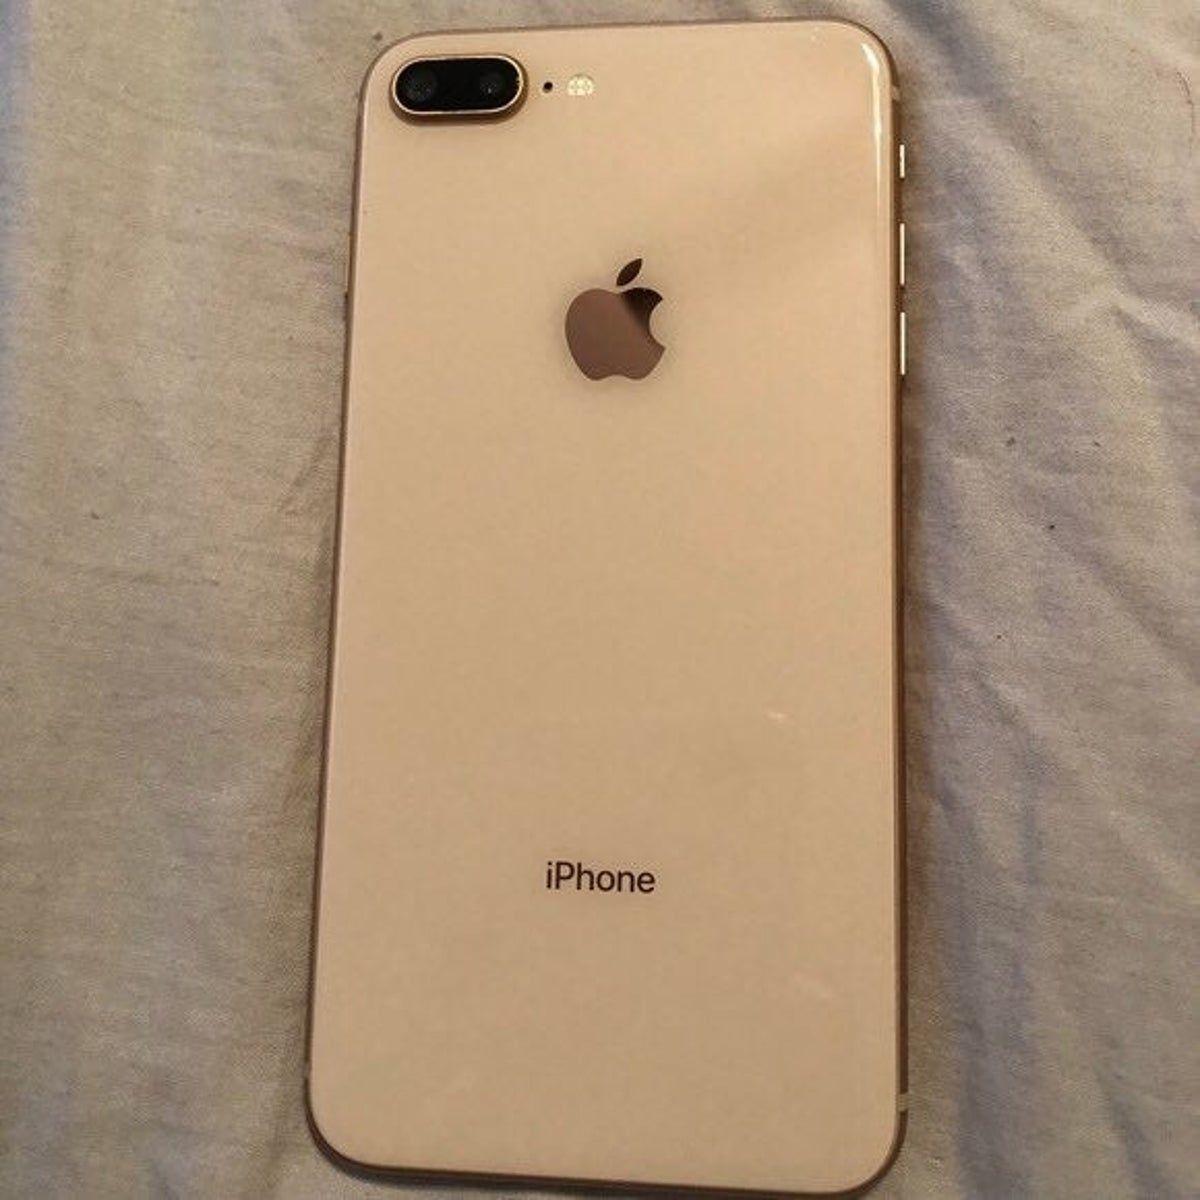 Iphone 8 Plus Iphone Iphone 8 Plus Iphone 8